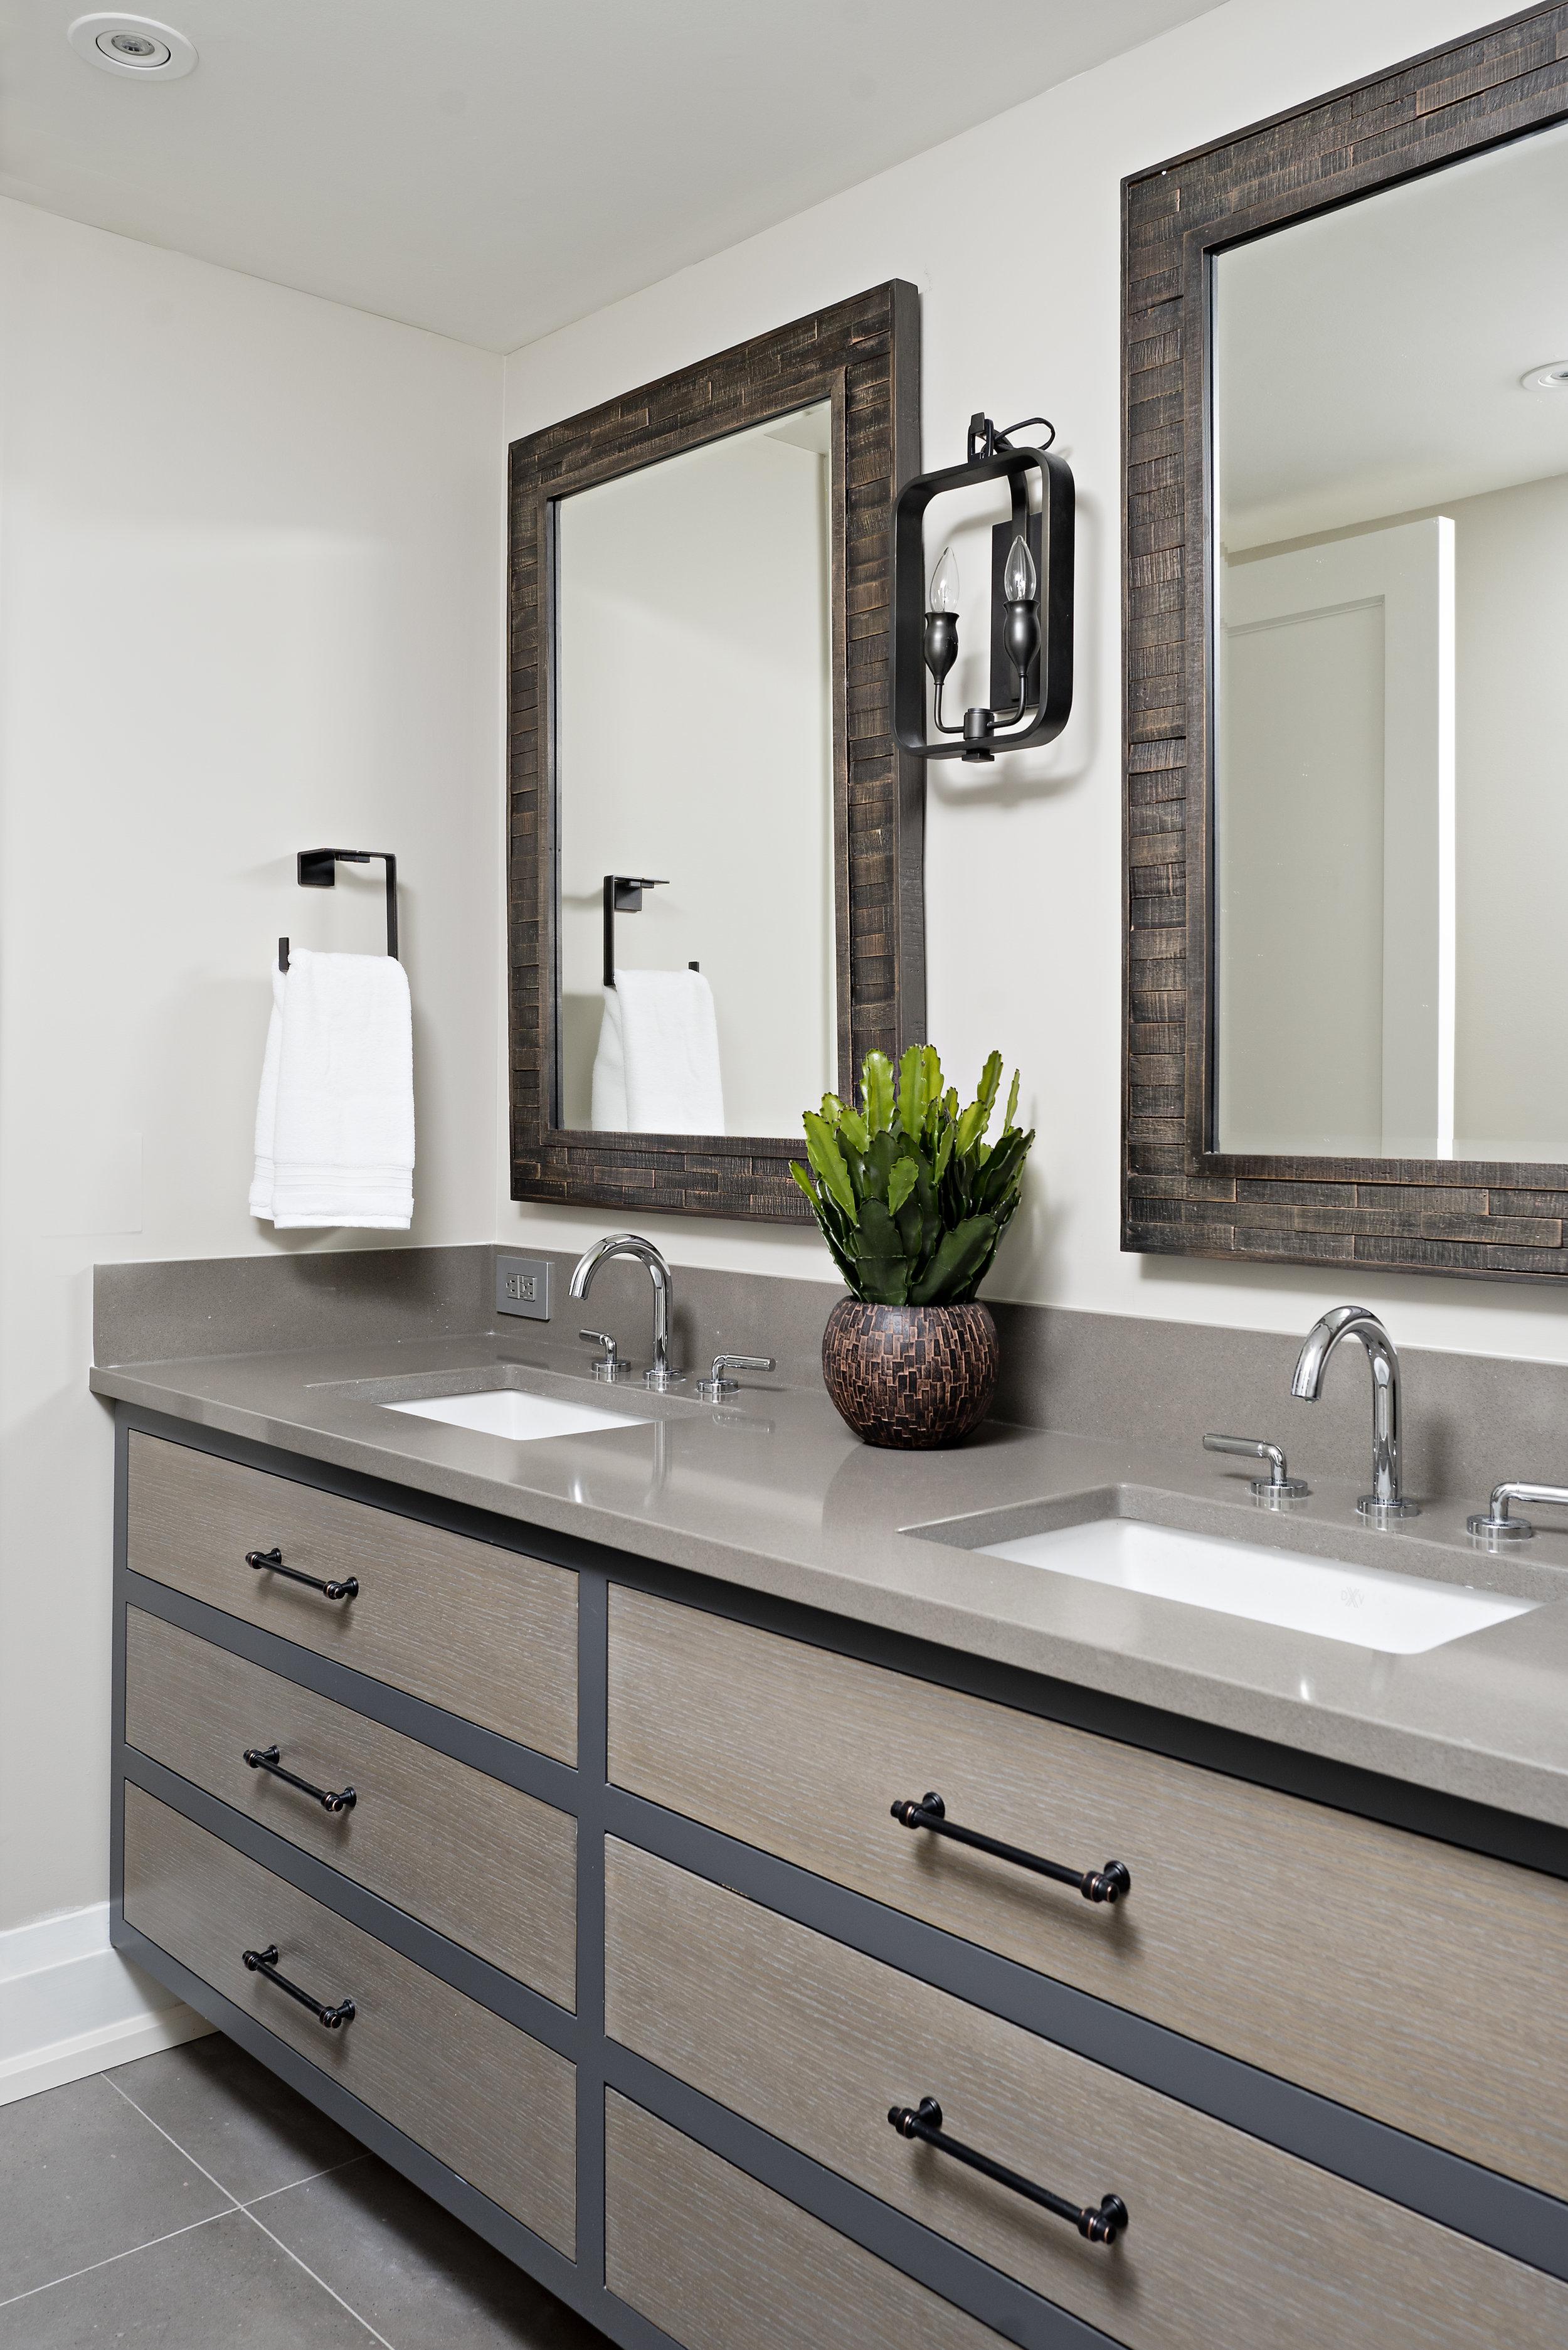 Interior Designer Pizzale Design Fresh Dual Bathroom Vanity Quartz Countertop Wood Cabinets.jpg